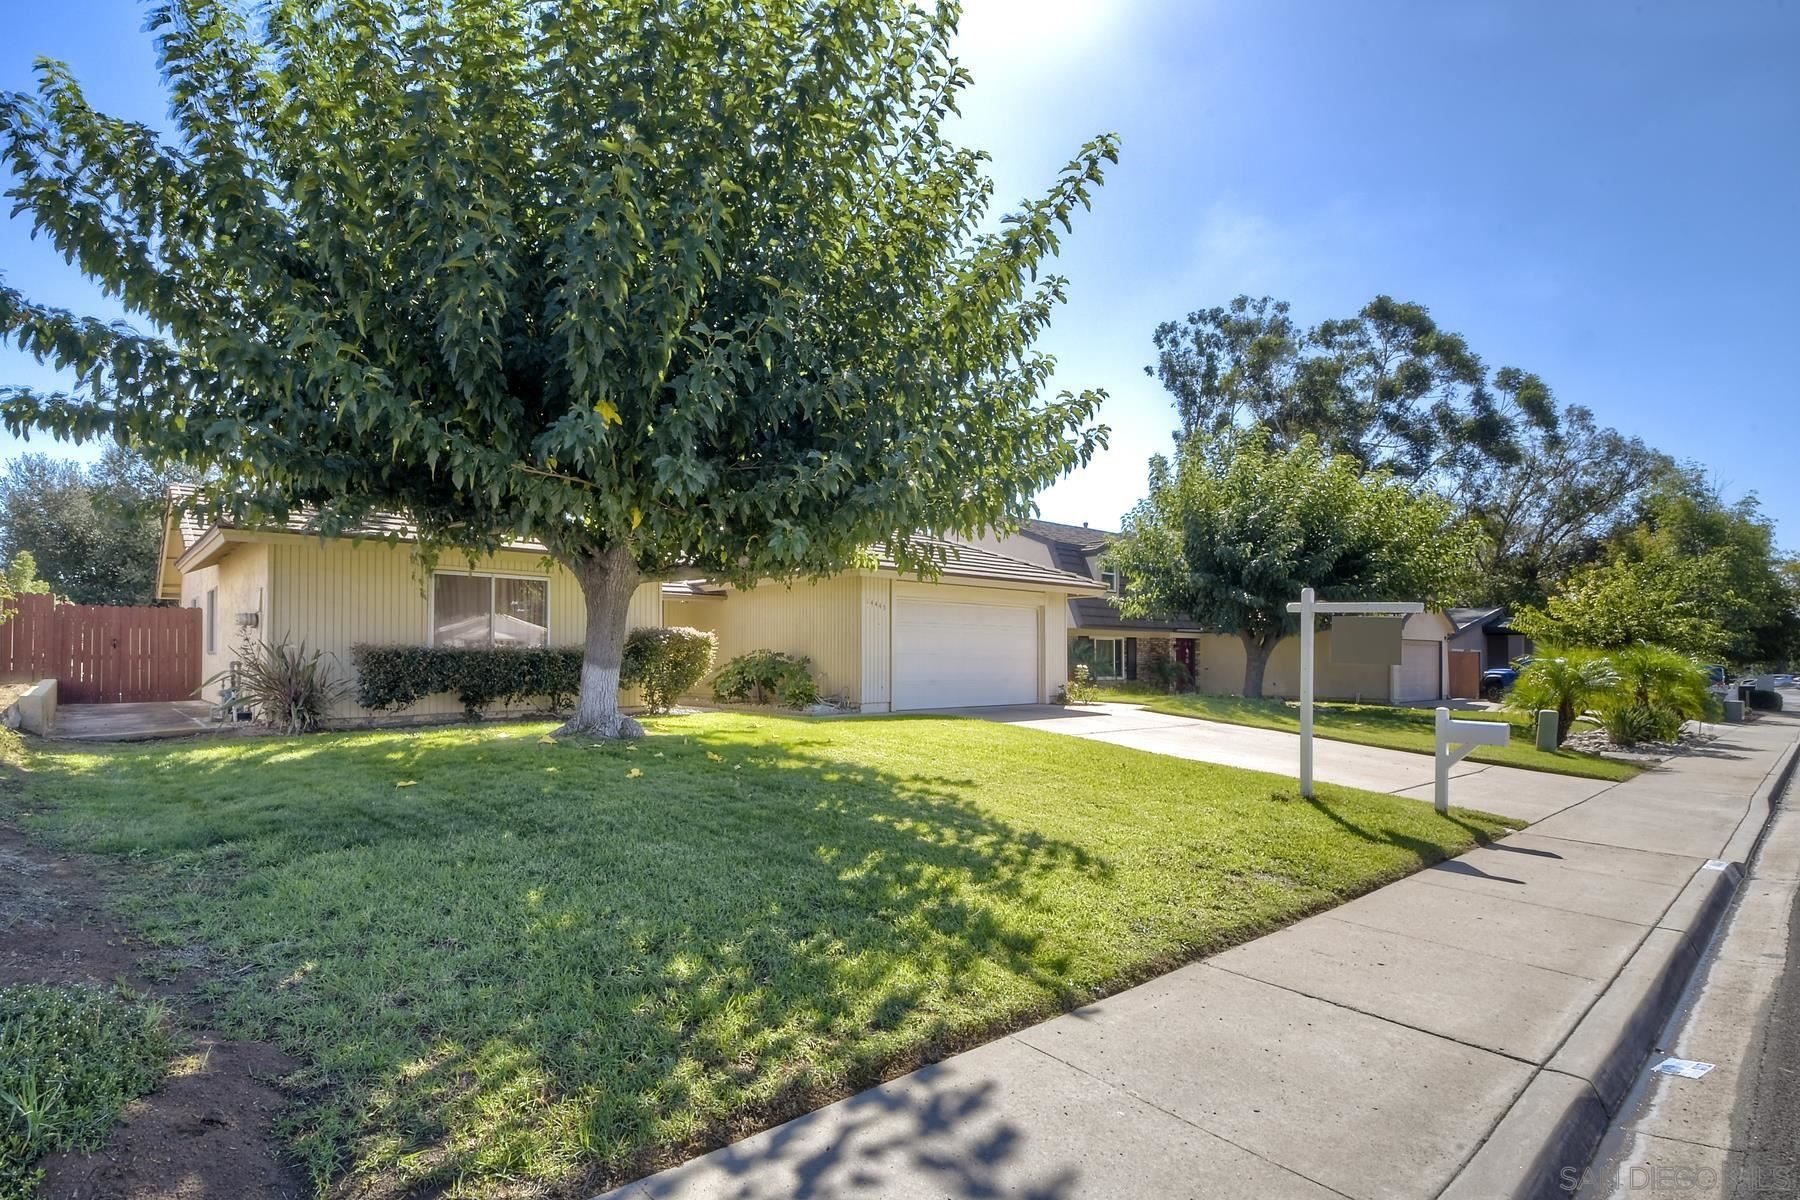 Photo of 14445 Hillndale Way, Poway, CA 92064 (MLS # 210028552)